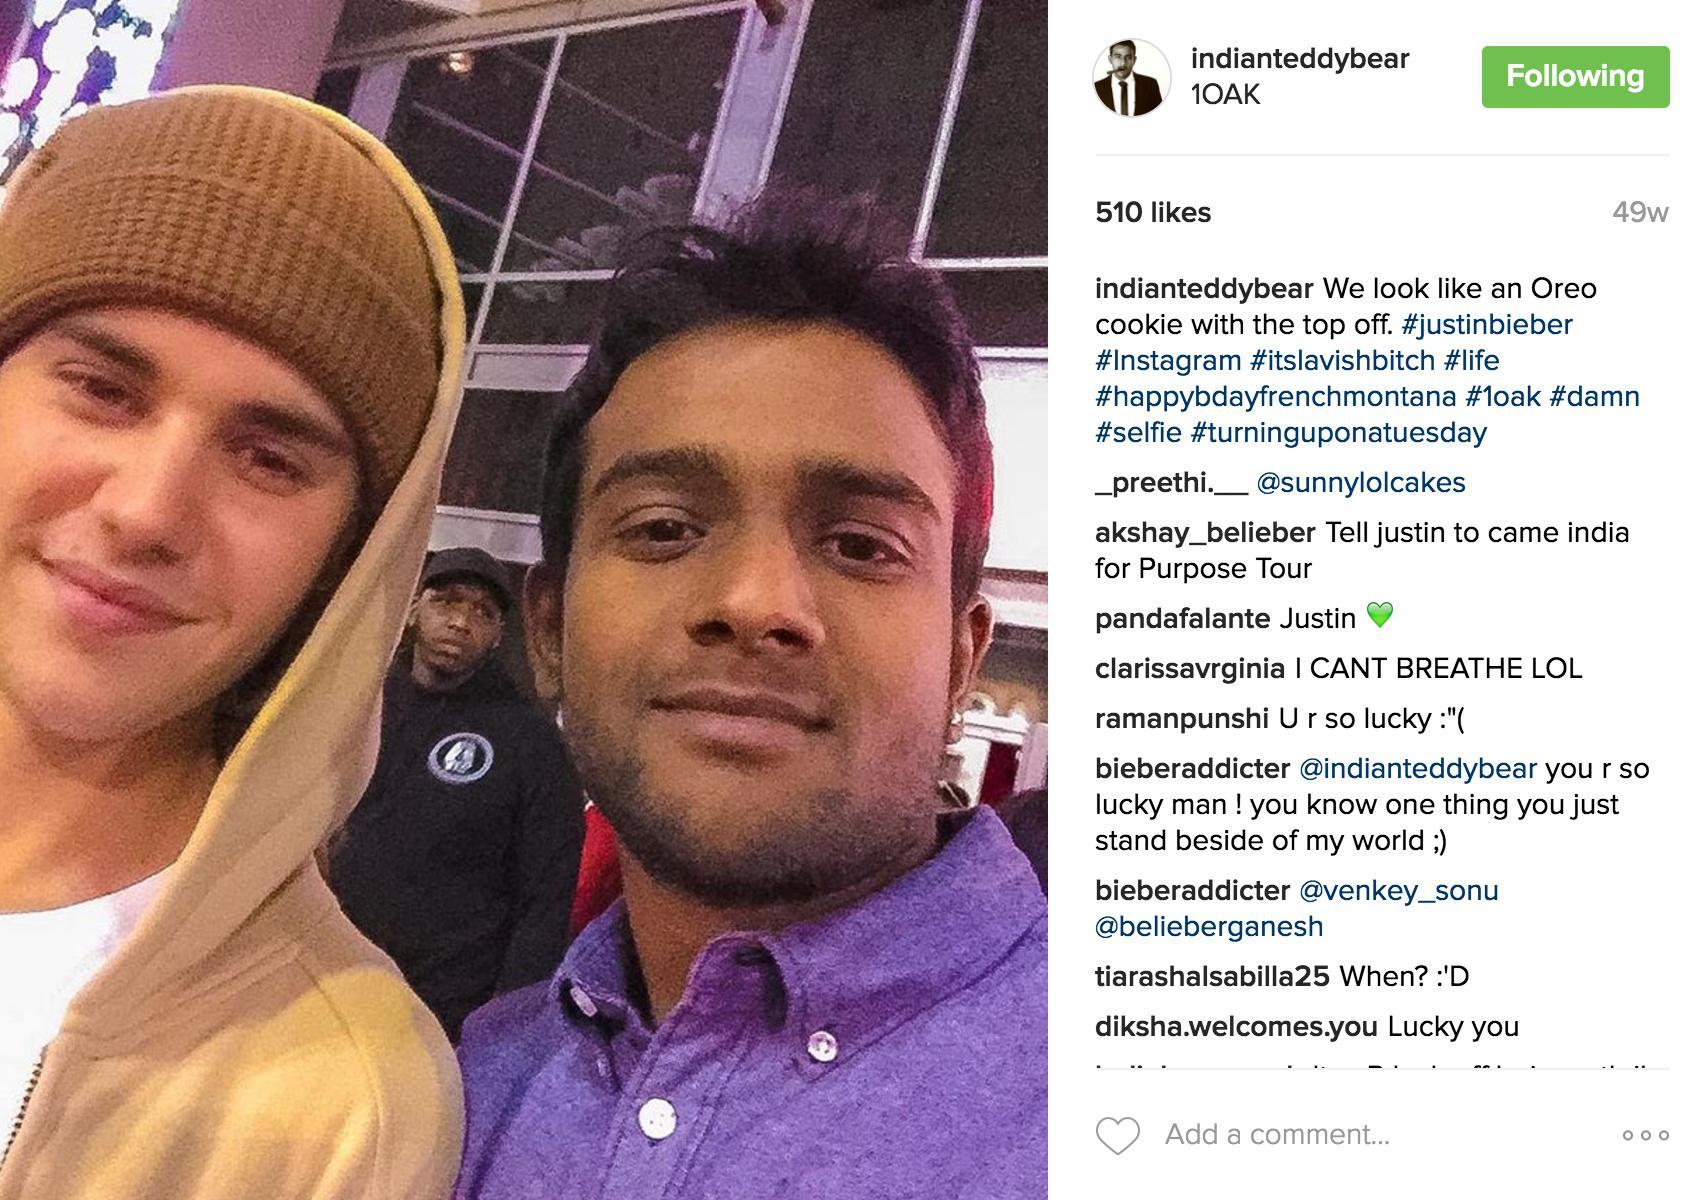 Justin Bieber indianteddybear